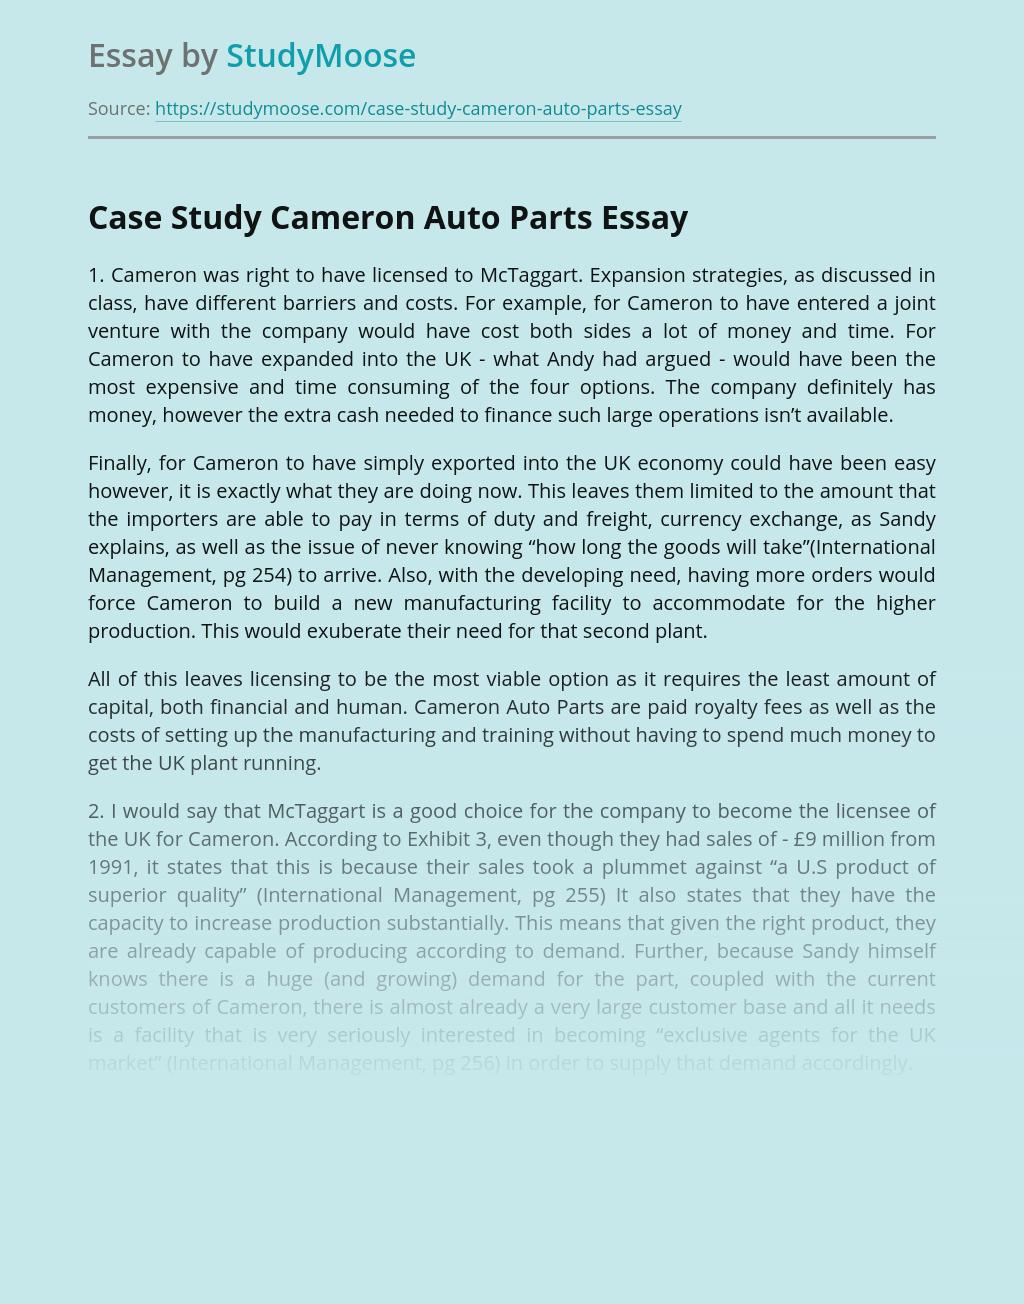 Case Study Cameron Auto Parts